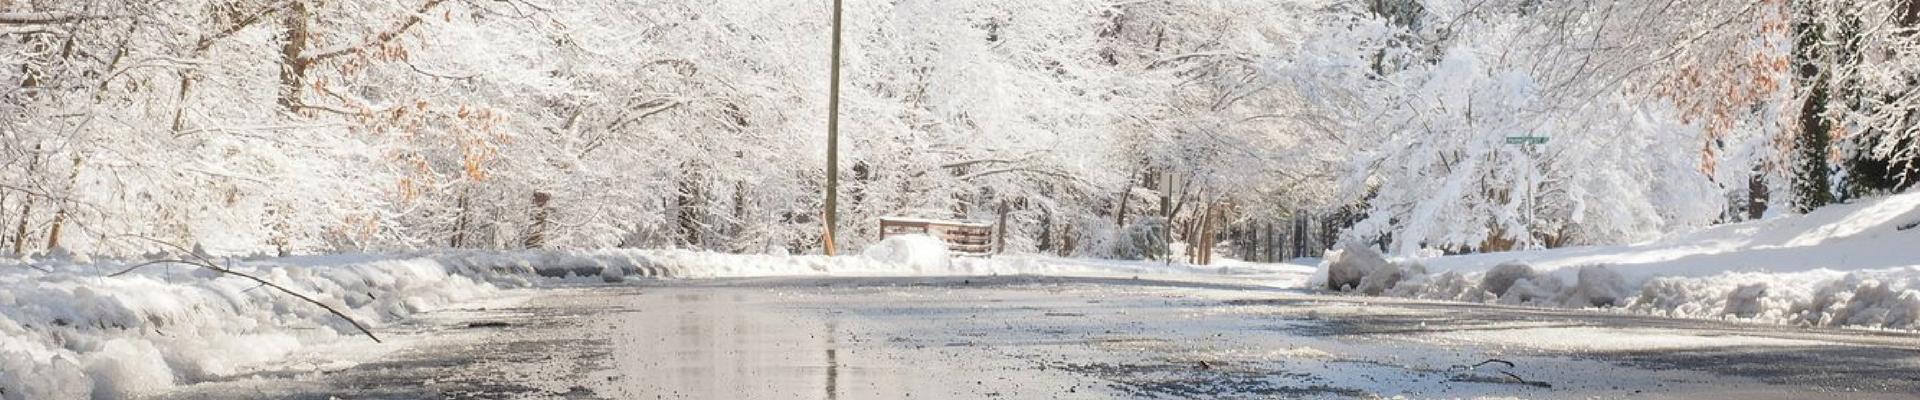 winter weather road